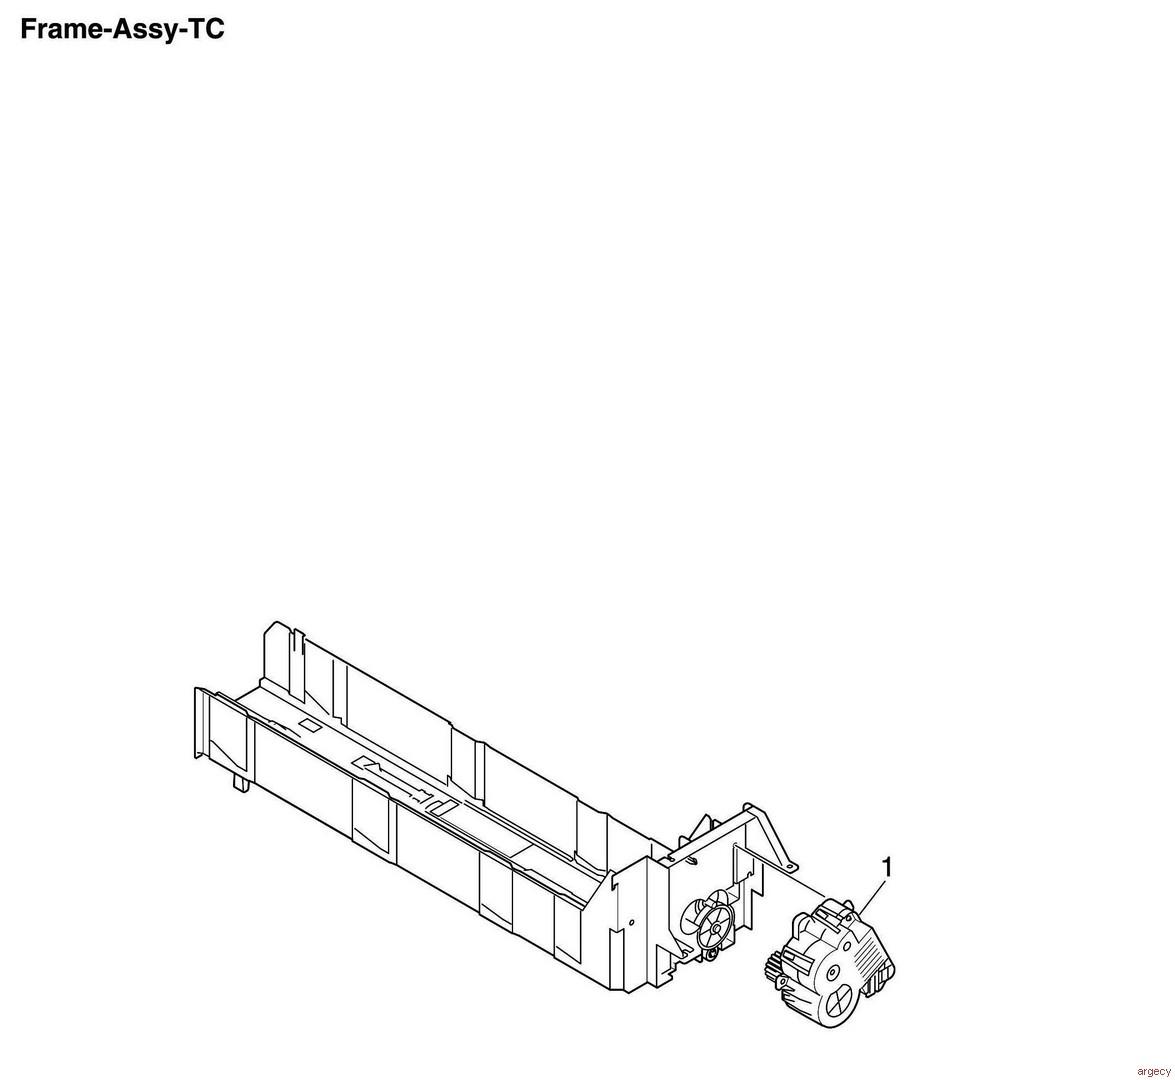 http://www.argecy.com/images/C911_C931_C941_Parts-9_cr.jpg